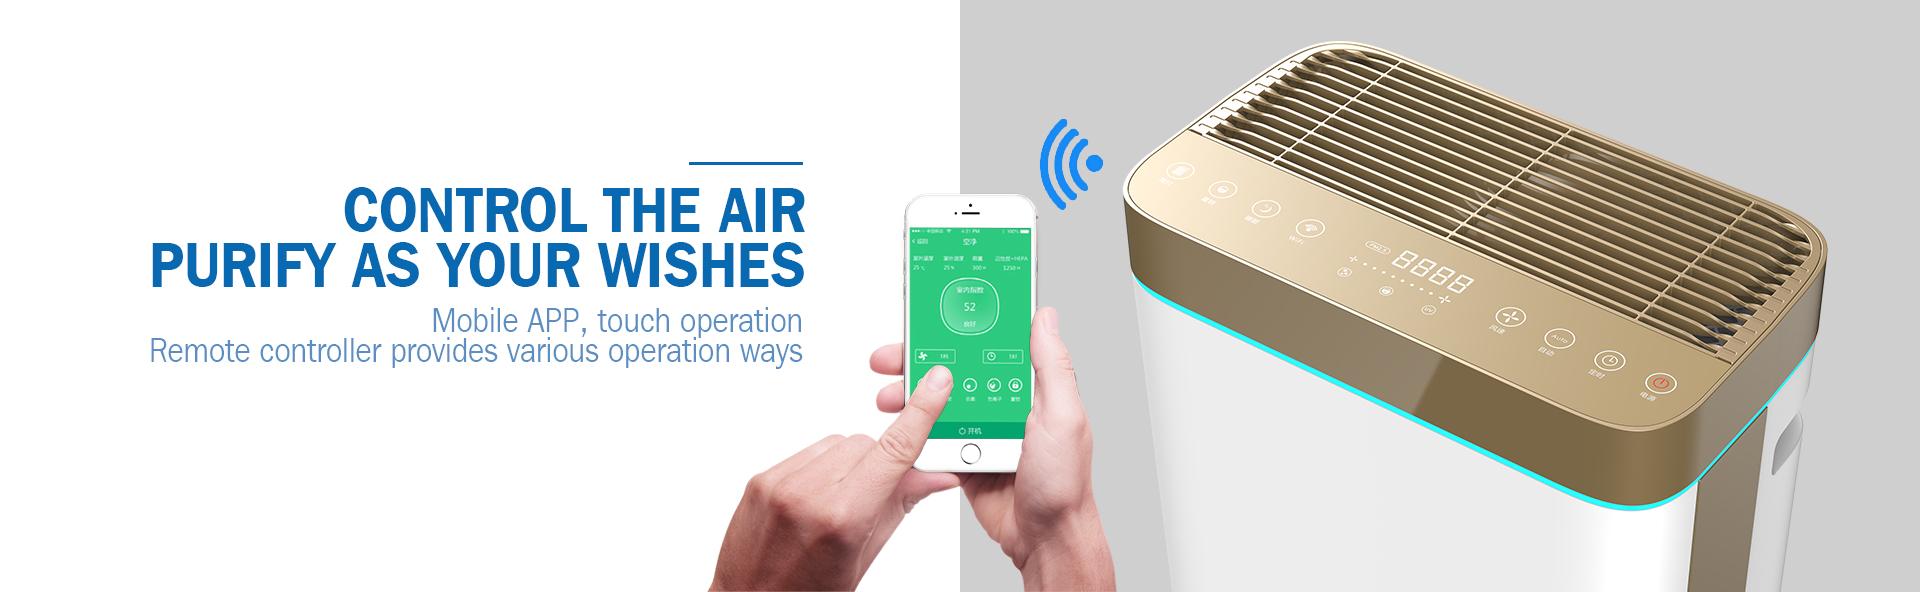 ozone generator air purifier,ozone generator air purifier,ozone generator air purifier